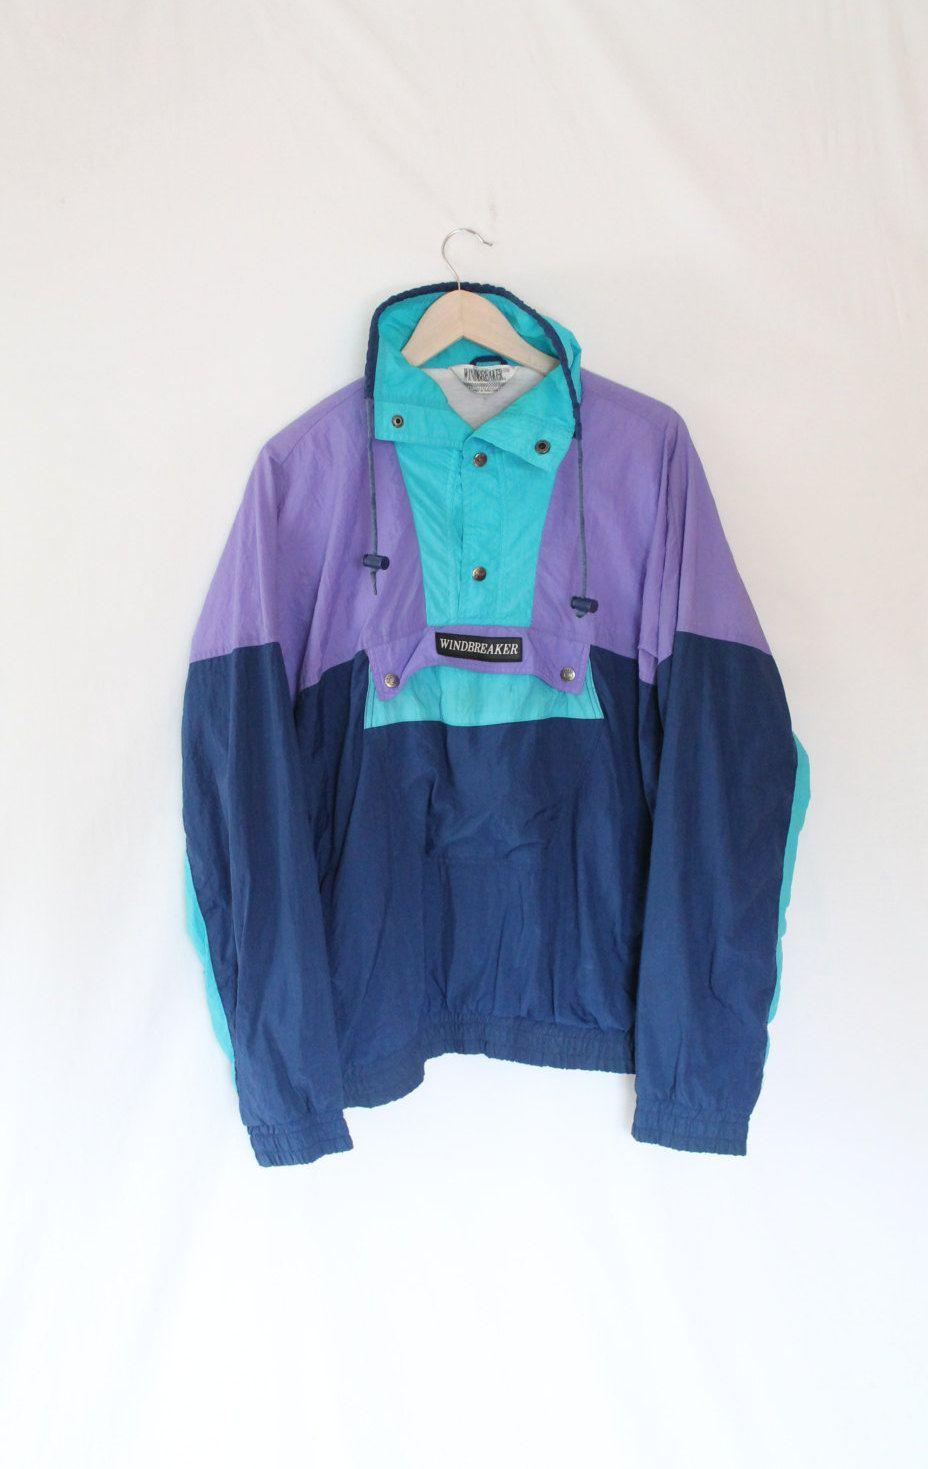 86510e9e Rare 90s Windbreaker Snap Up Pullover by WINDBREAKER // Vintage Vaporwave  Jackets // Colorblock Blue Turquoise Purple by VegaGenesisVintage on Etsy